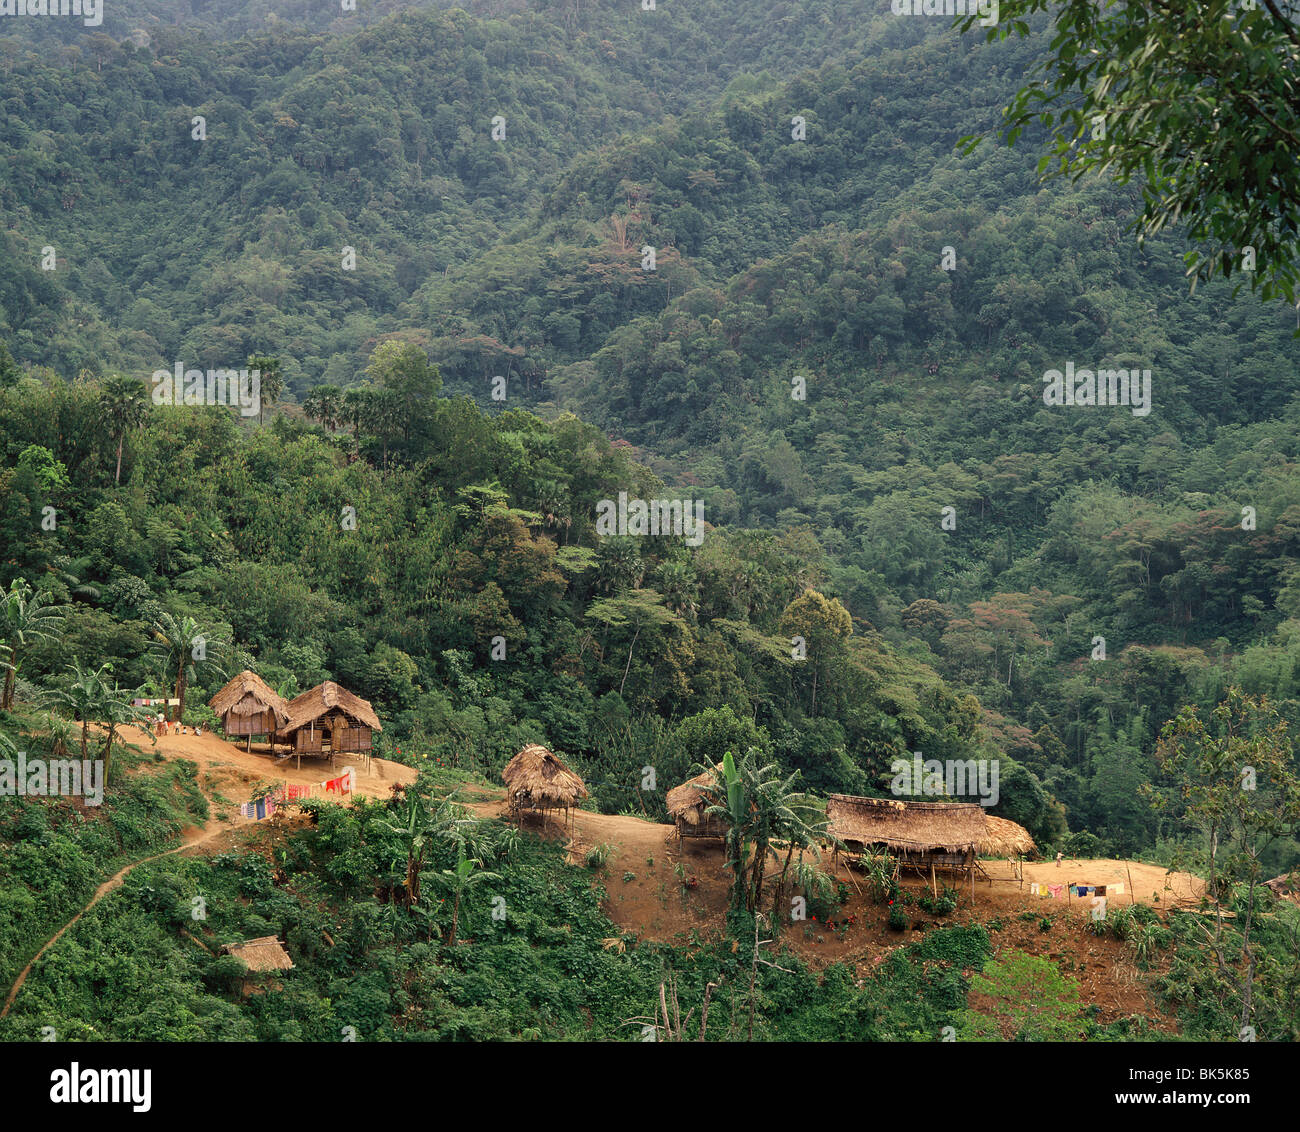 Orang Asli village in Cameron Highlands, Malaysia, Southeast Asia, Asia - Stock Image